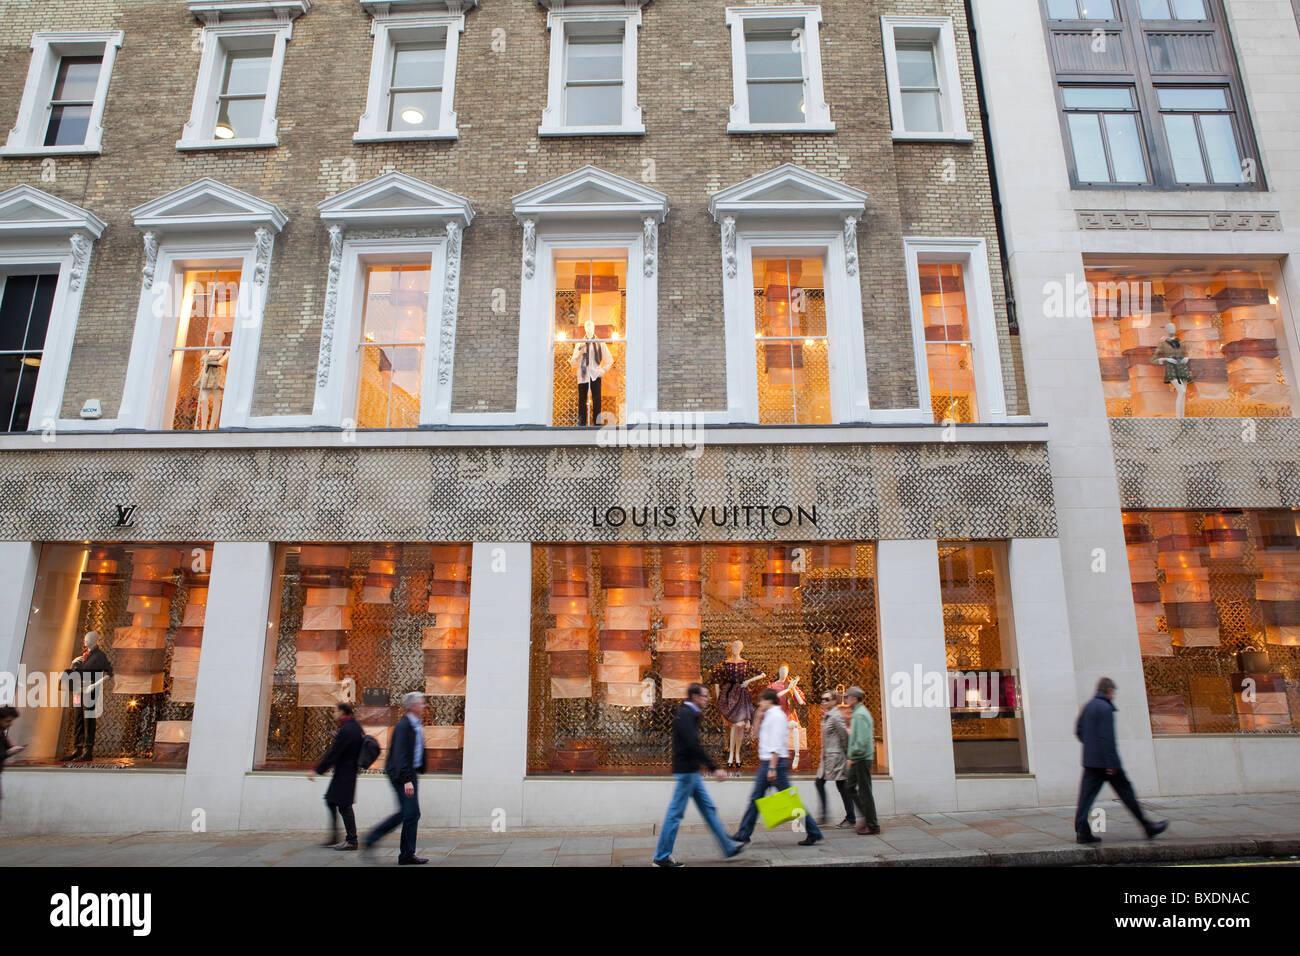 Louis Vuitton shop in New Bond street, London Stock Photo ...